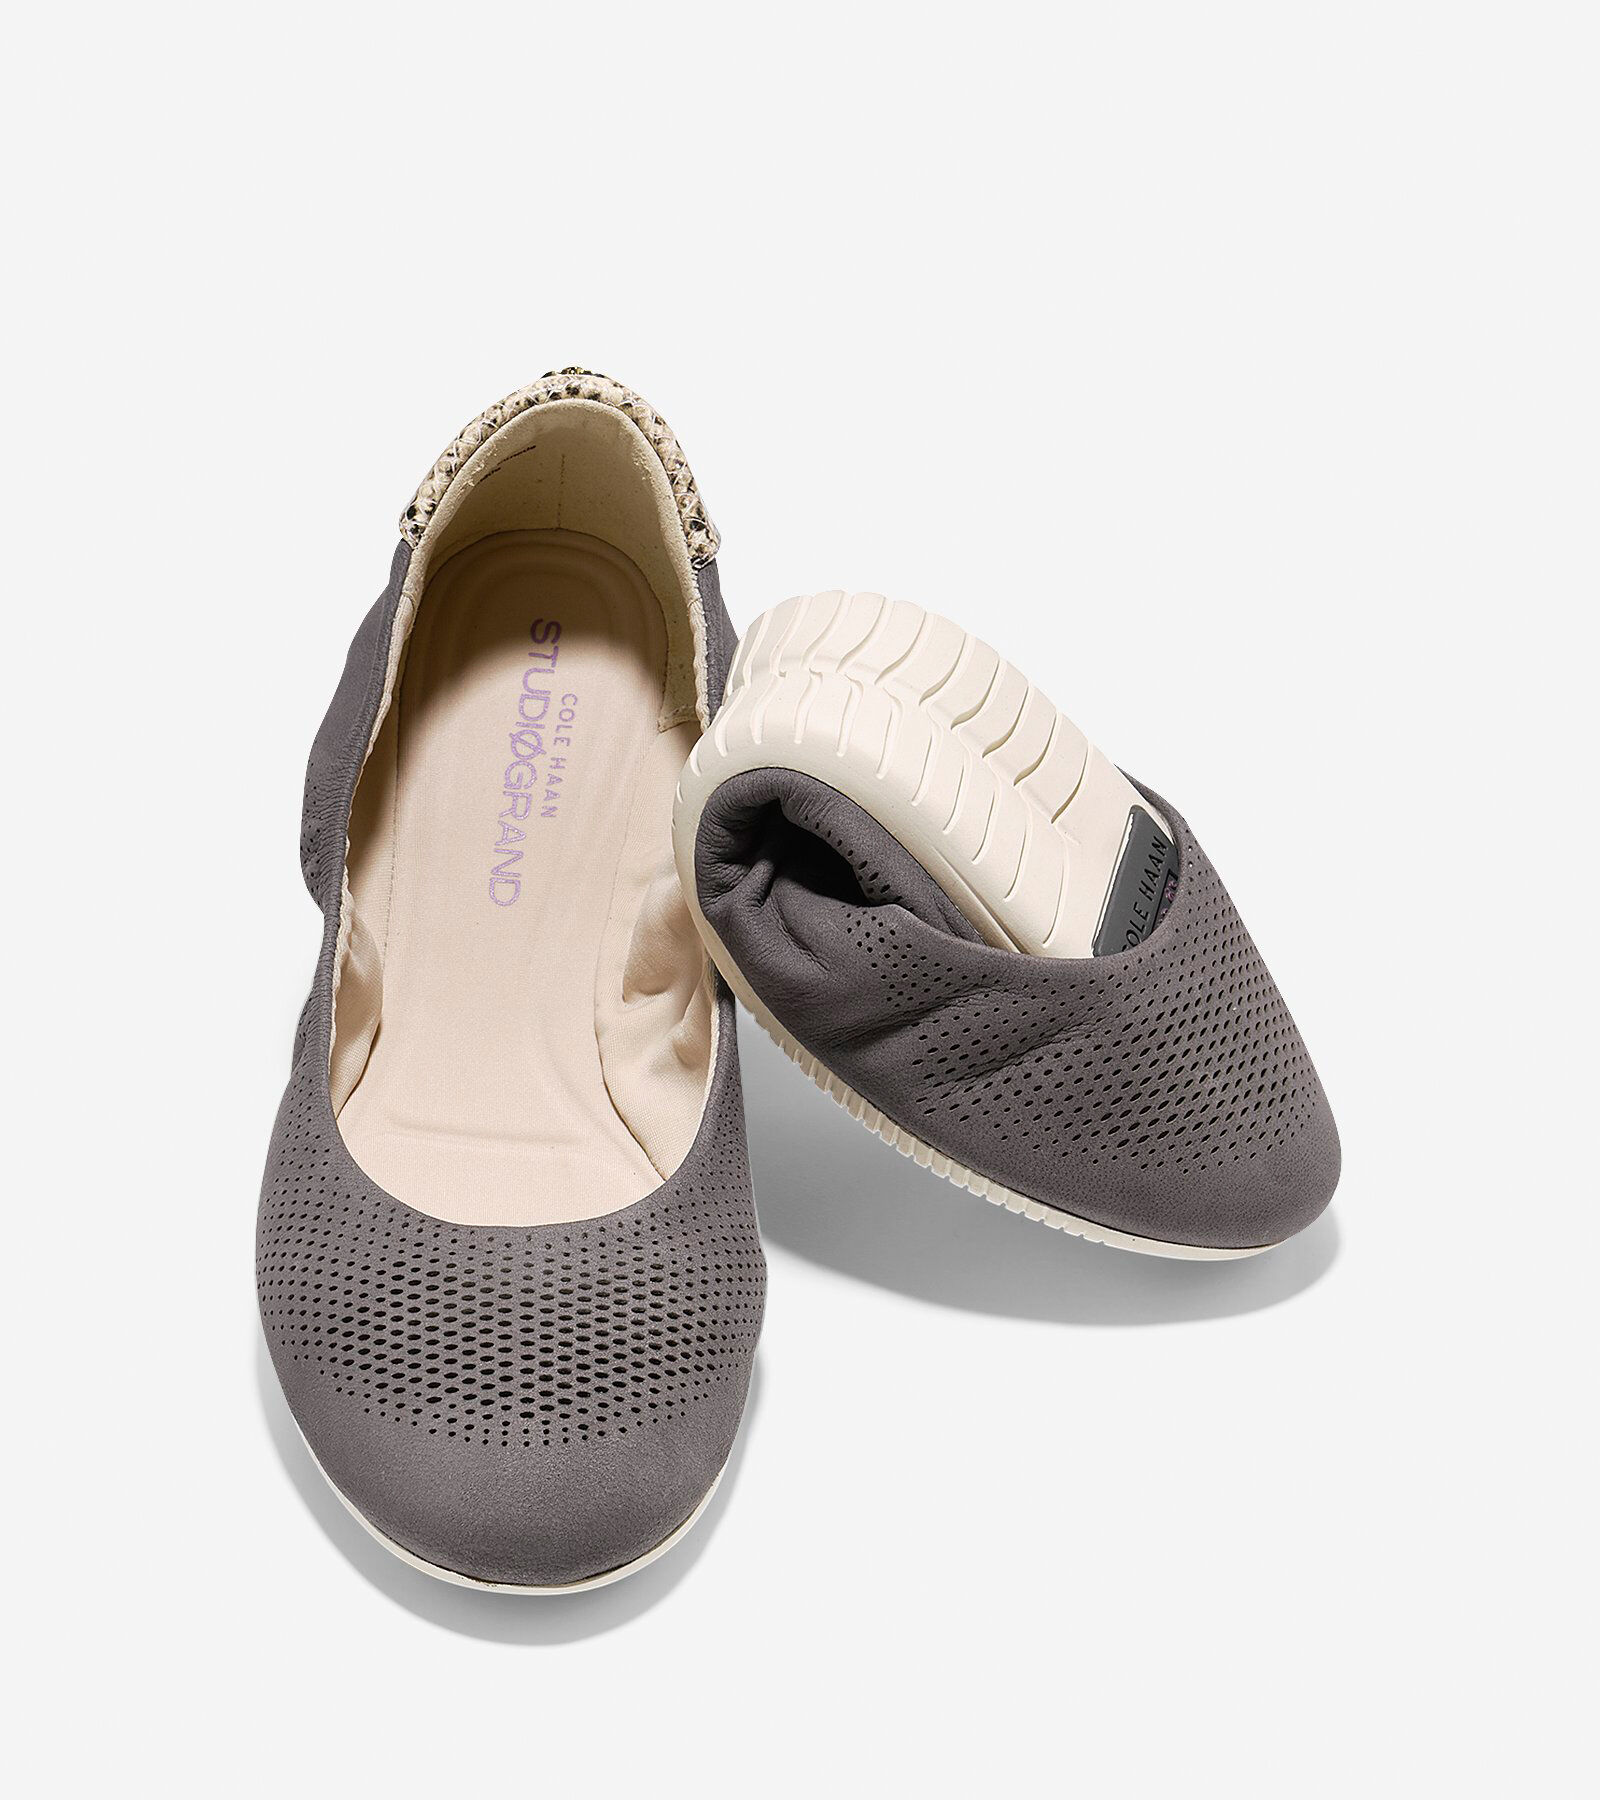 Cole Haan 2.0 StudiGrand Packable Ballet Leather Flat SGItIg